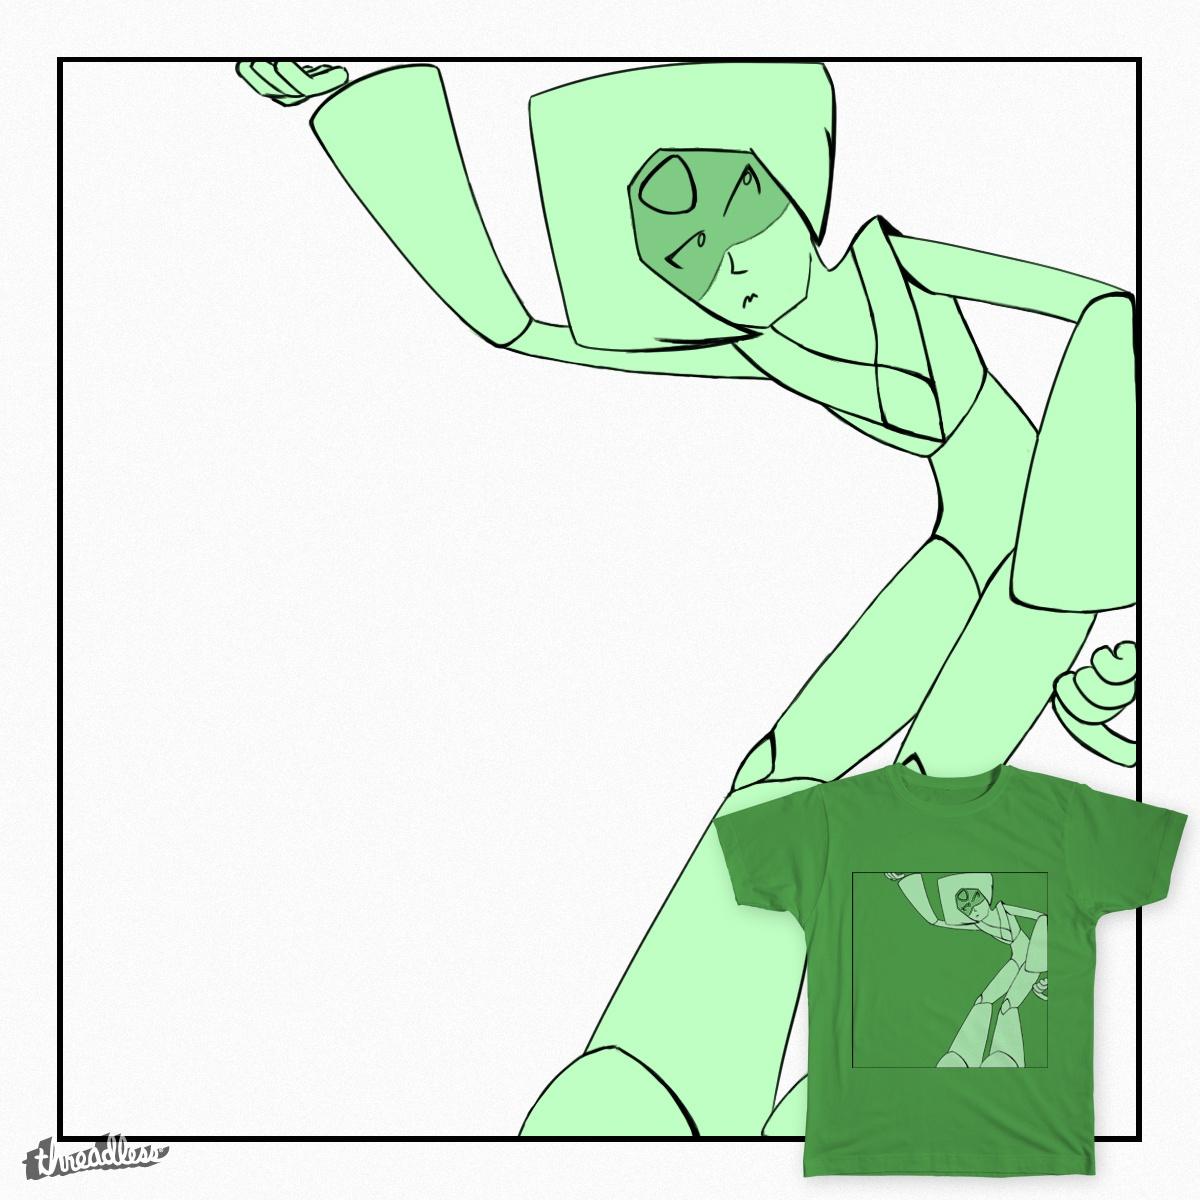 Packaged Green Dorito, a cool t-shirt design